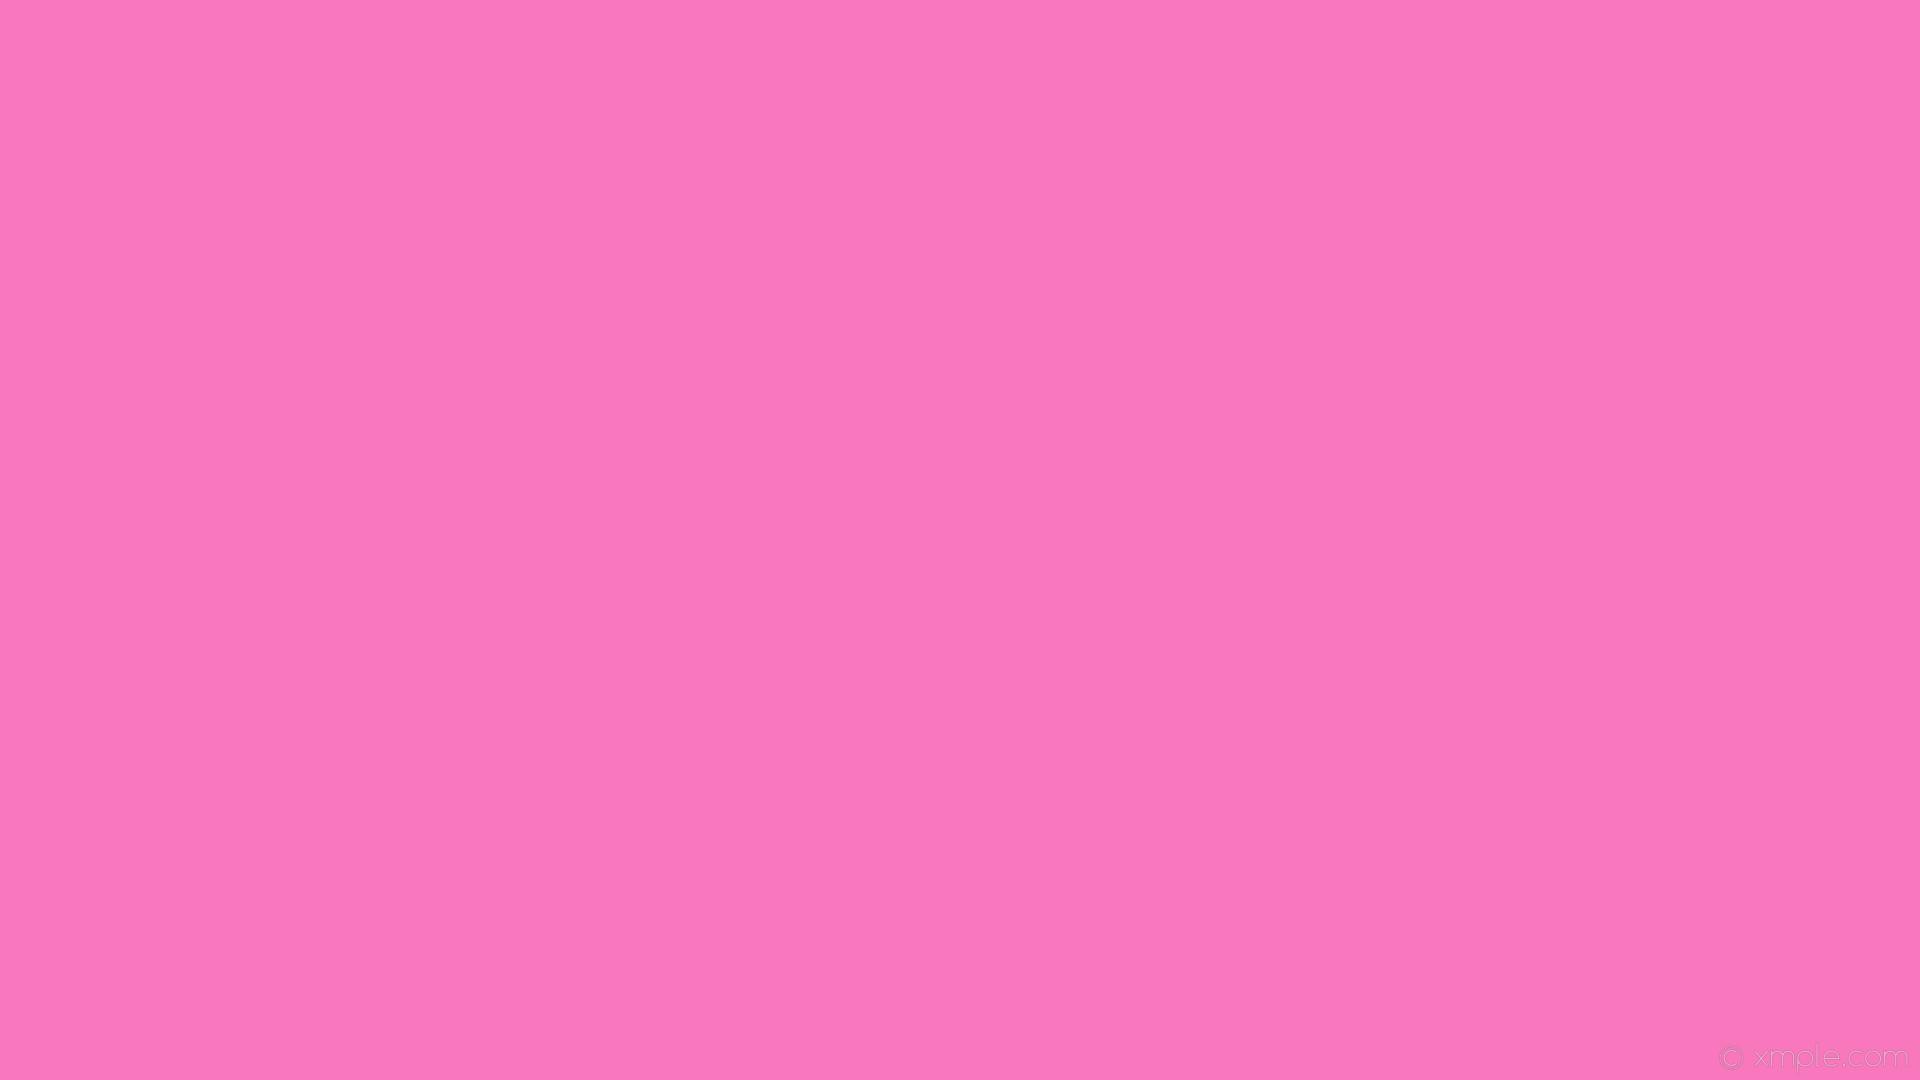 Pink Color Pink Wallpaper 68 Images